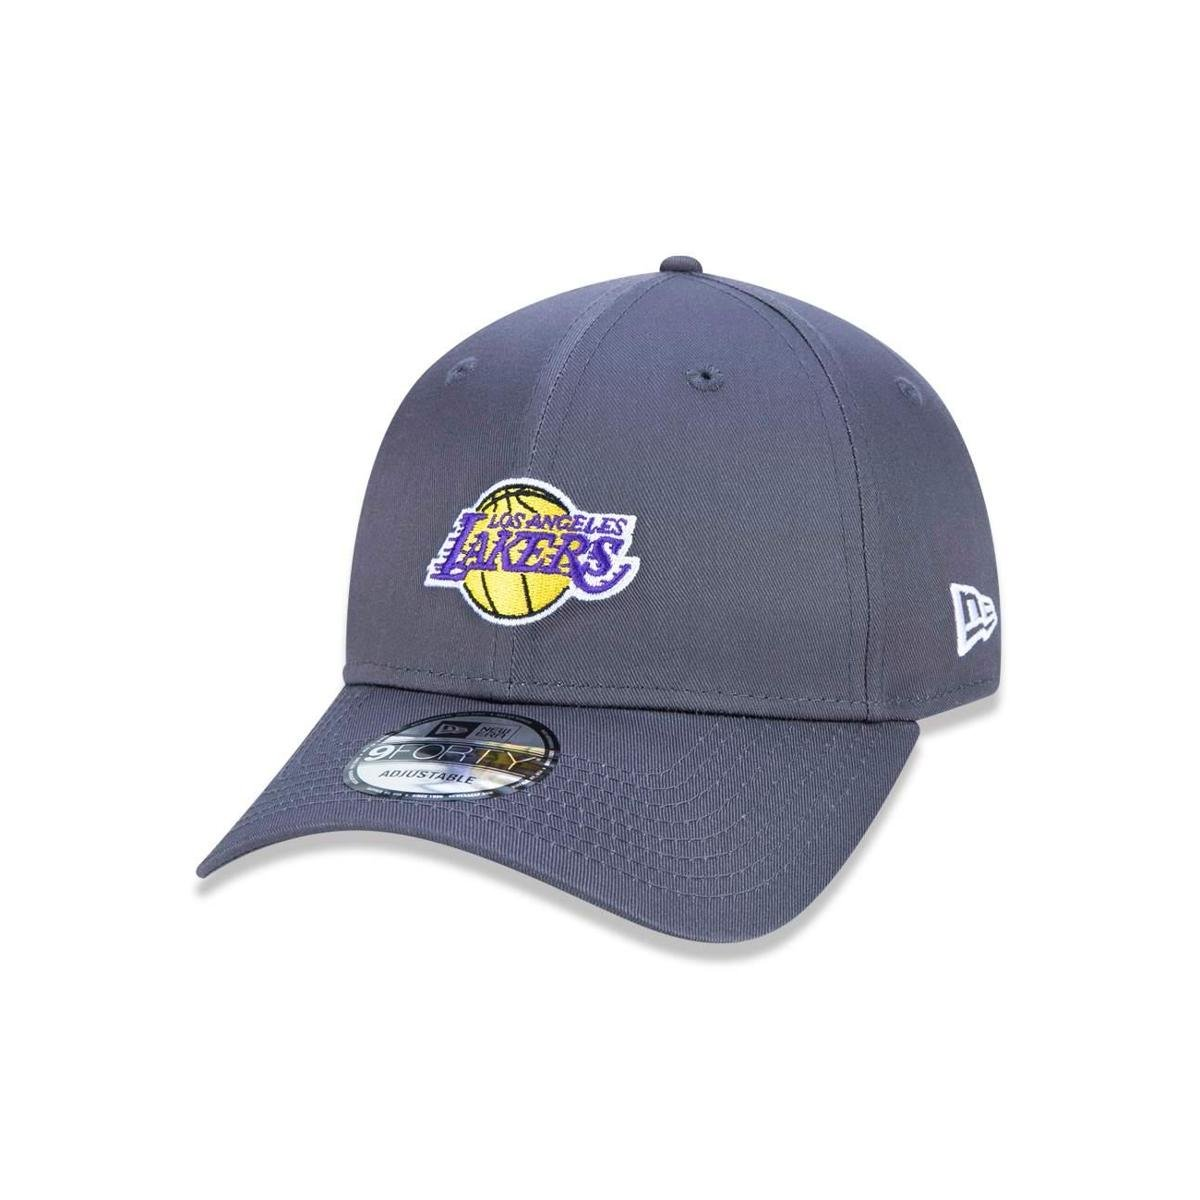 Boné 940 Los Angeles Lakers NBA Aba Curva Snapback New Era - Compre ... 7e93bb305b9